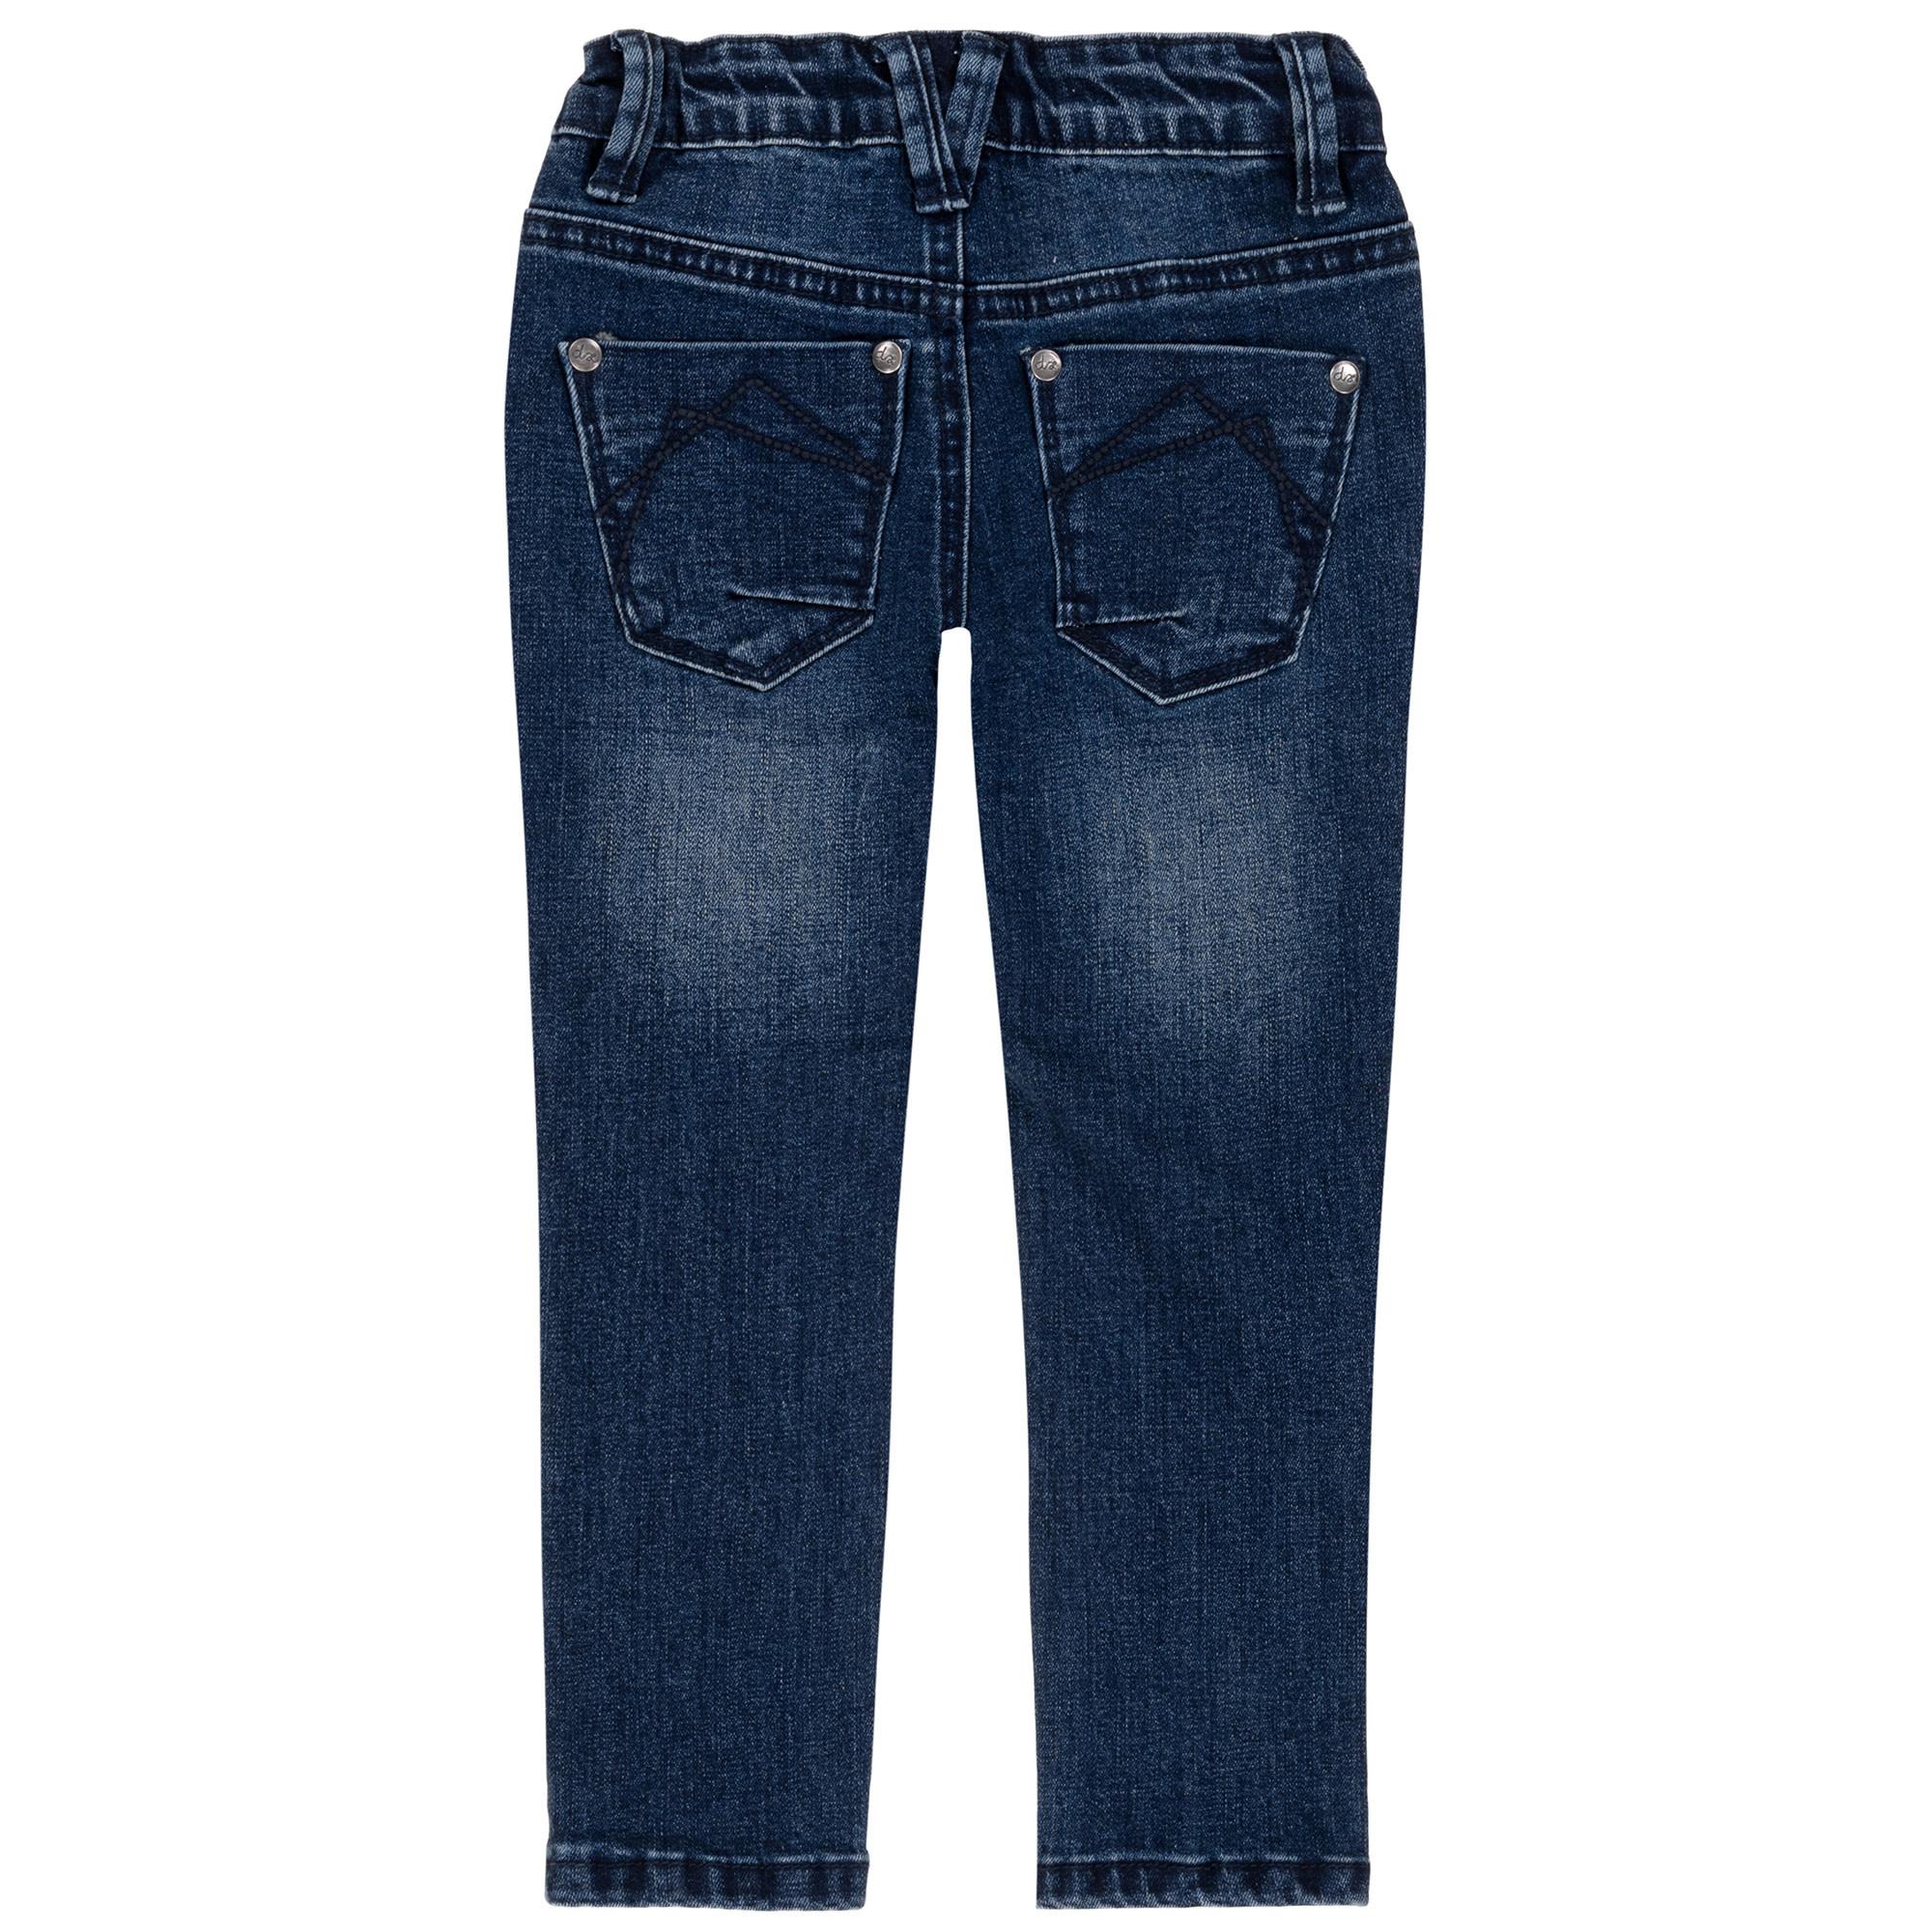 Terrell Jeans